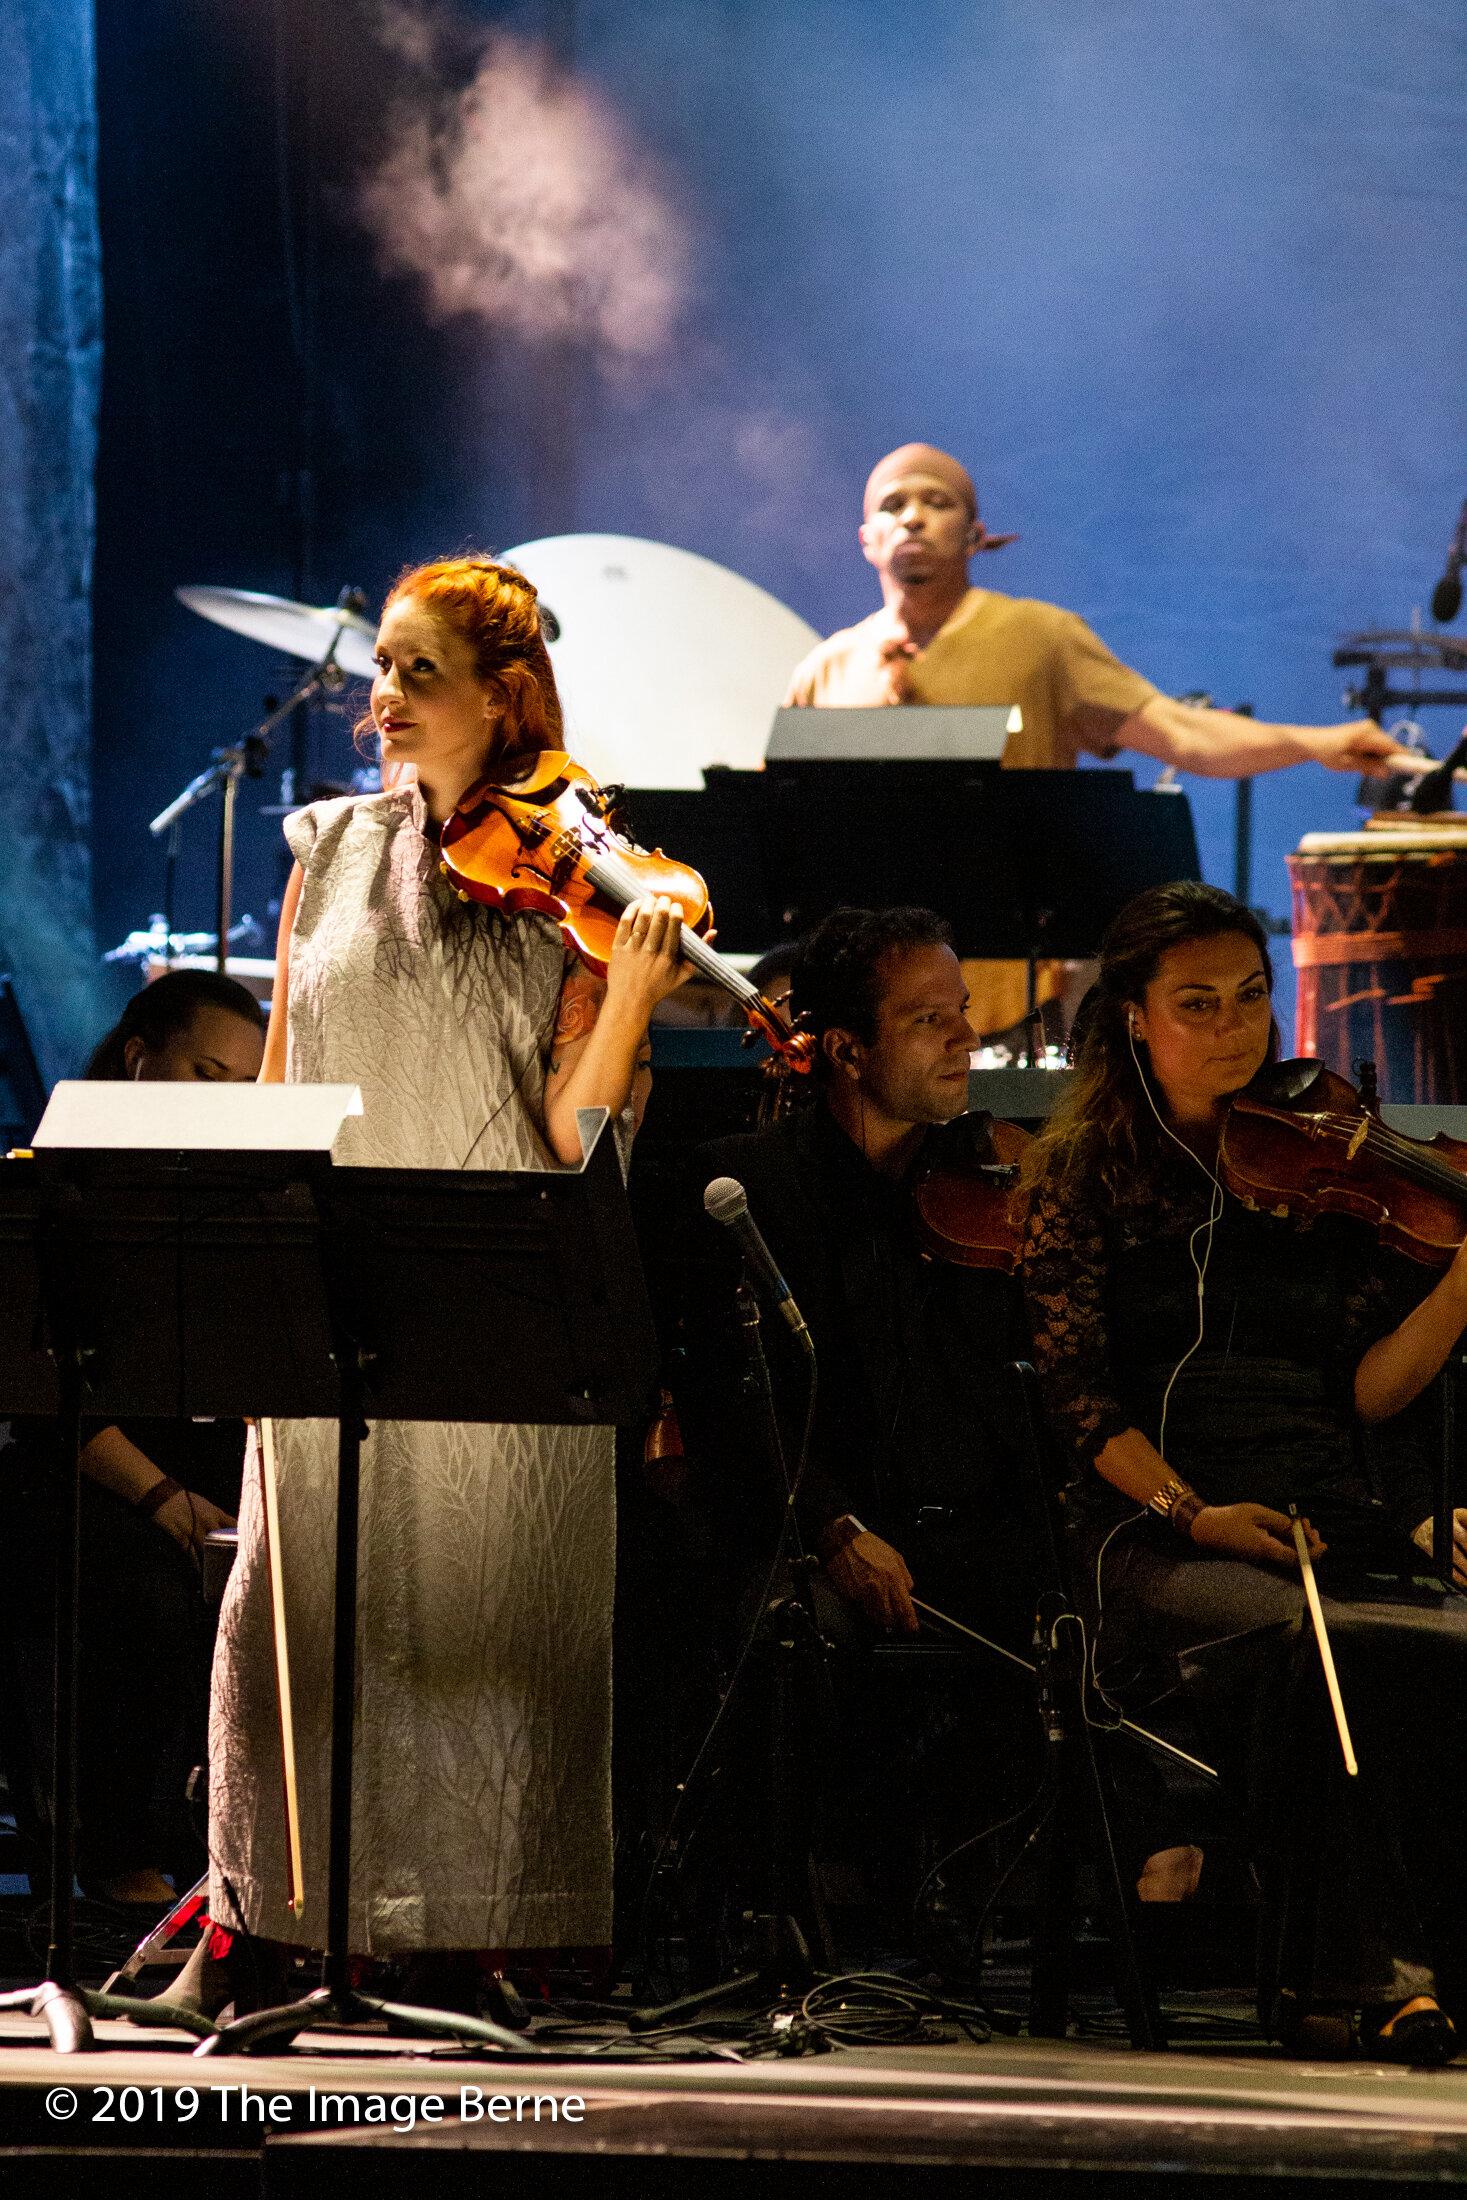 Game of Thrones Concert-24.jpg